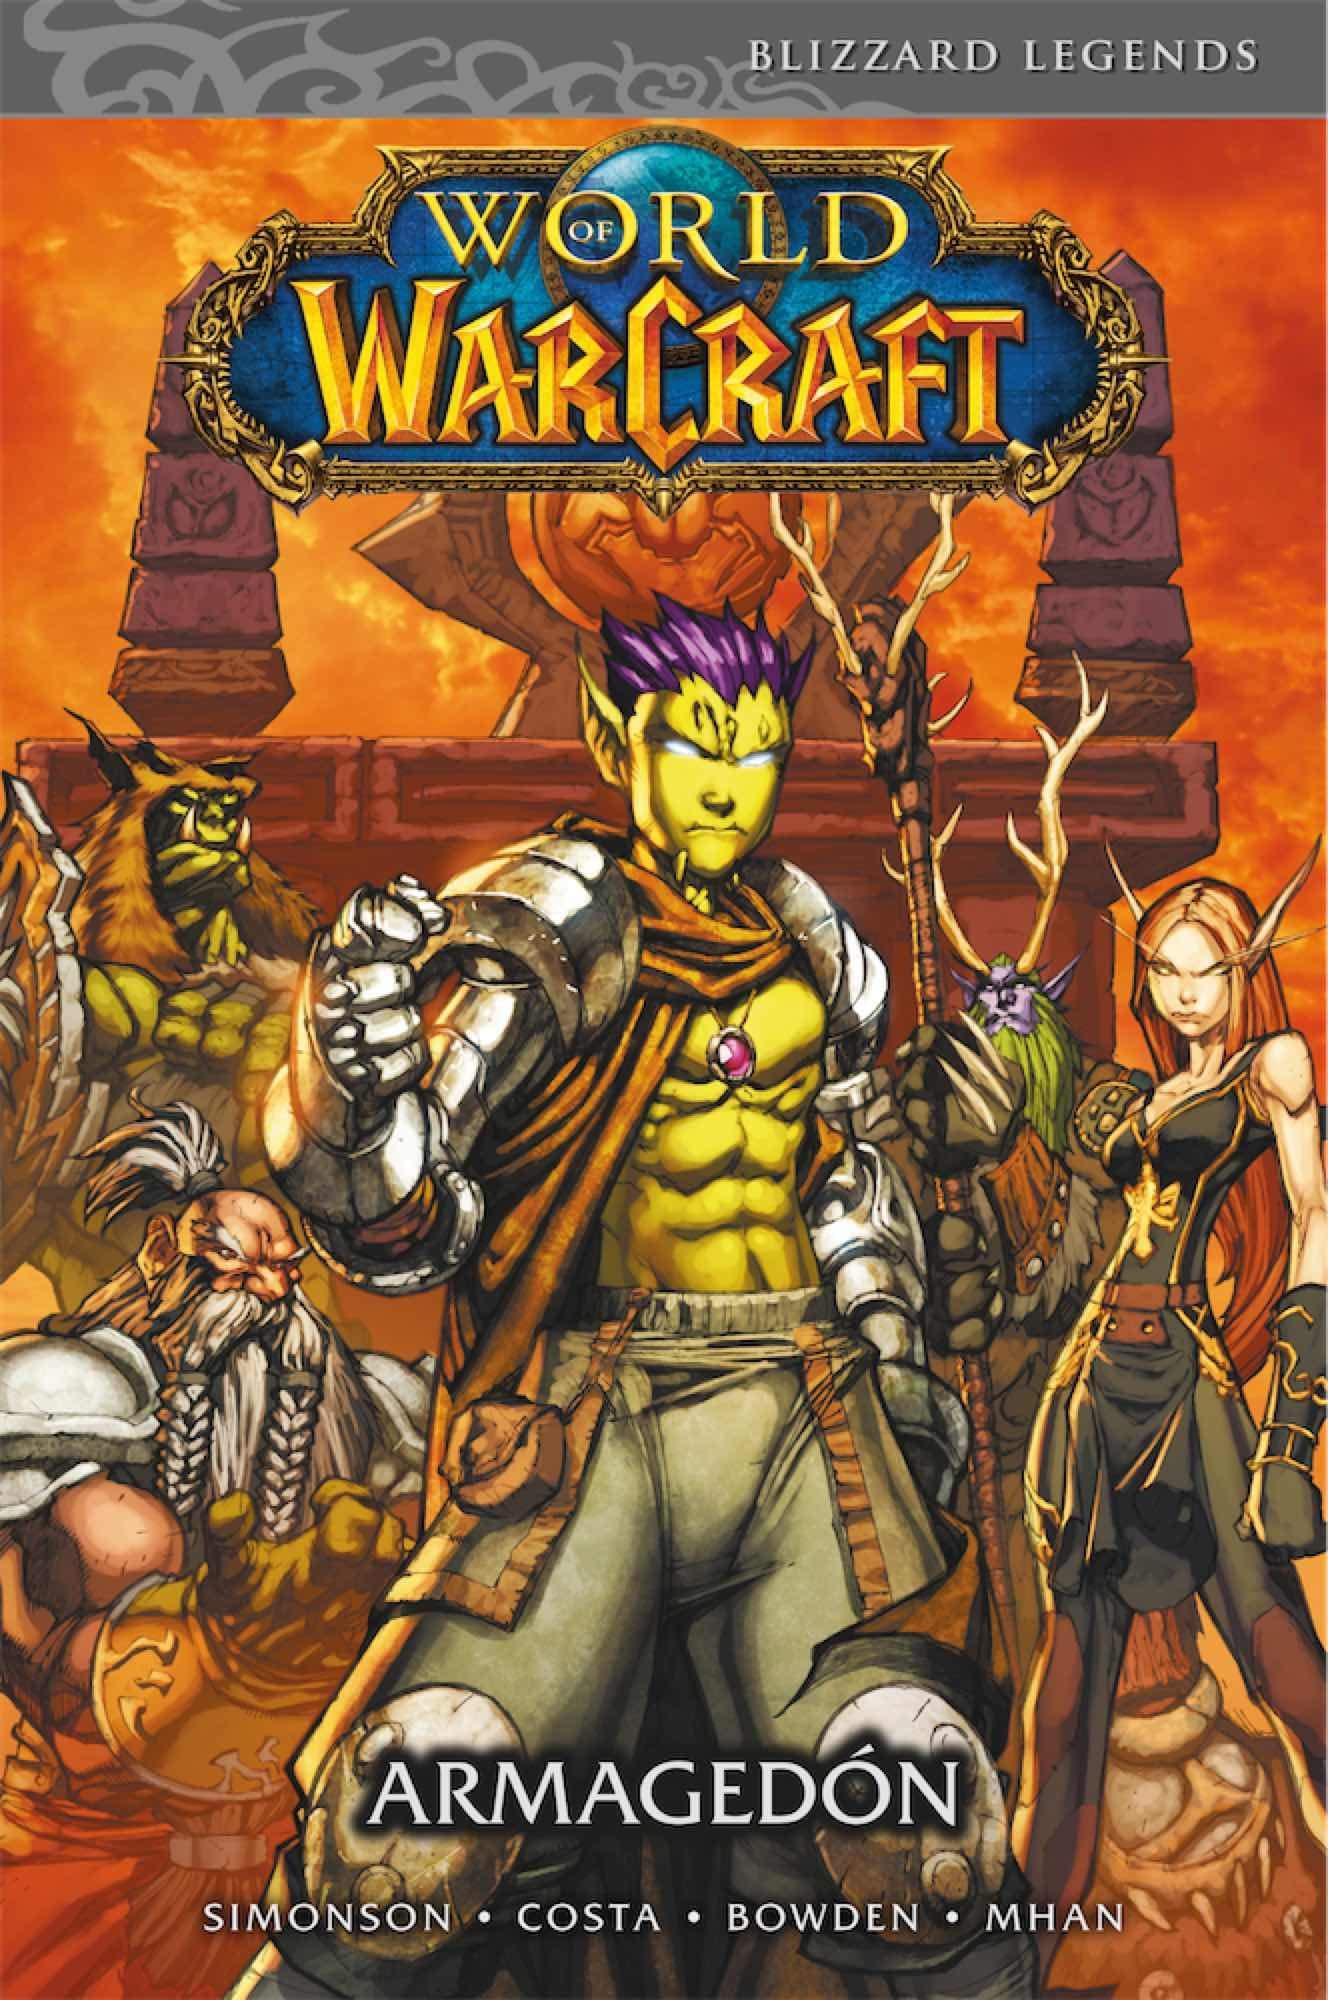 cronologia warcraft libros